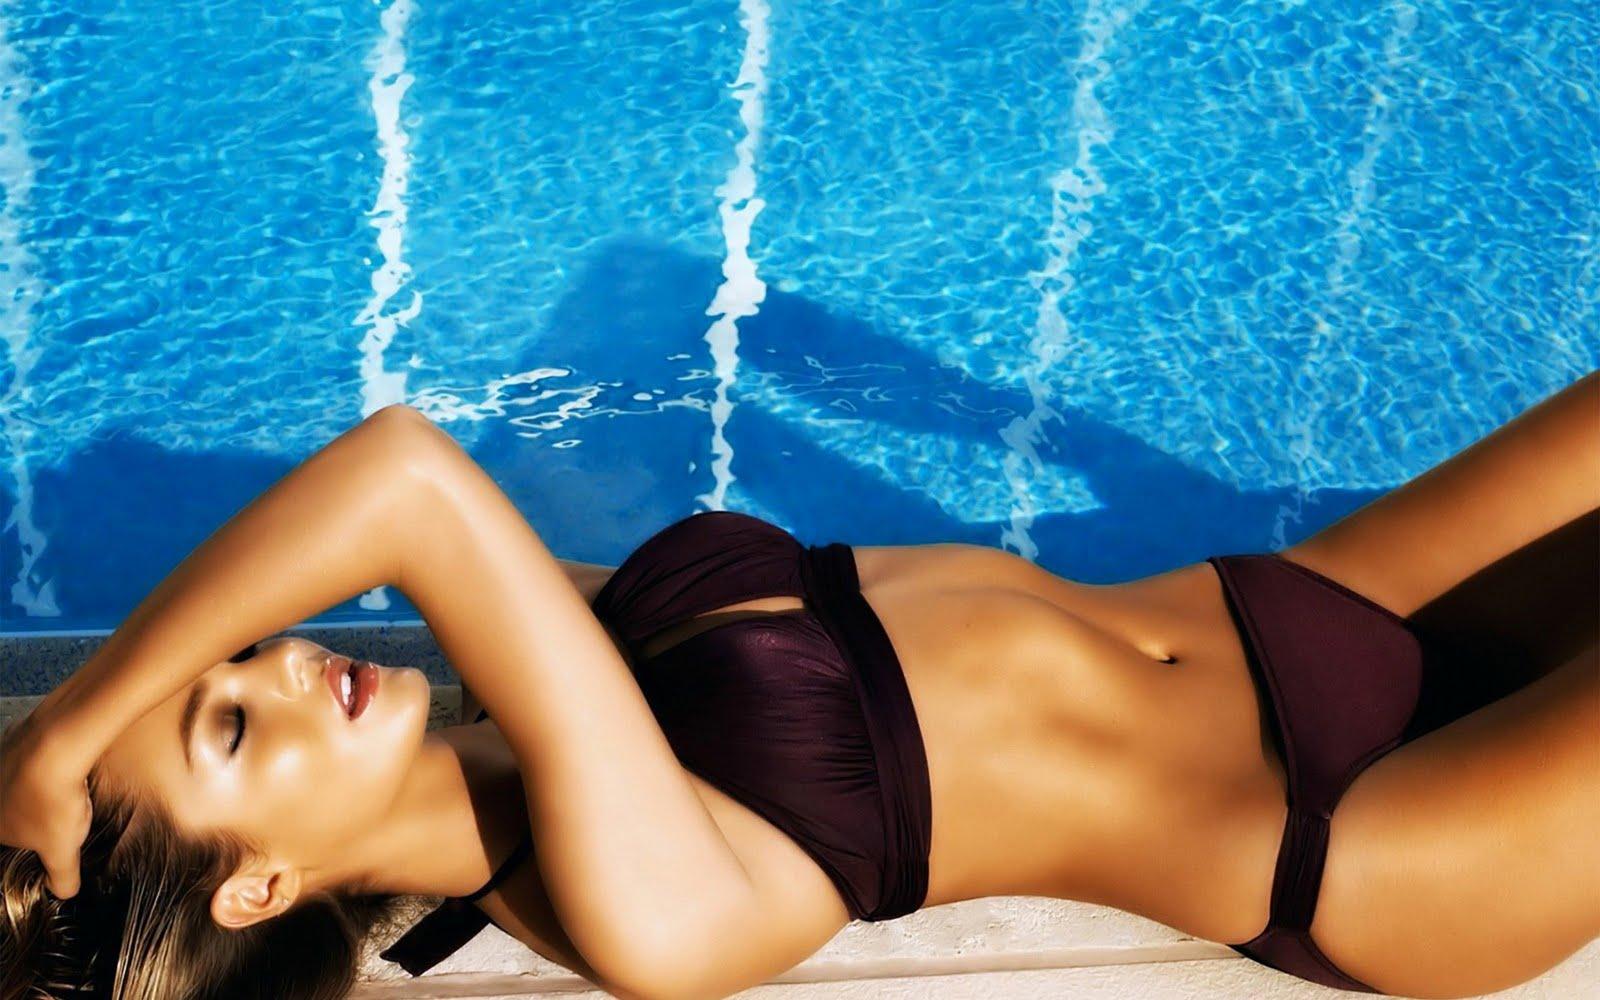 Candice swanepoel bikini hd wallpapers hot photos hub - Hd bikini wallpaper download ...